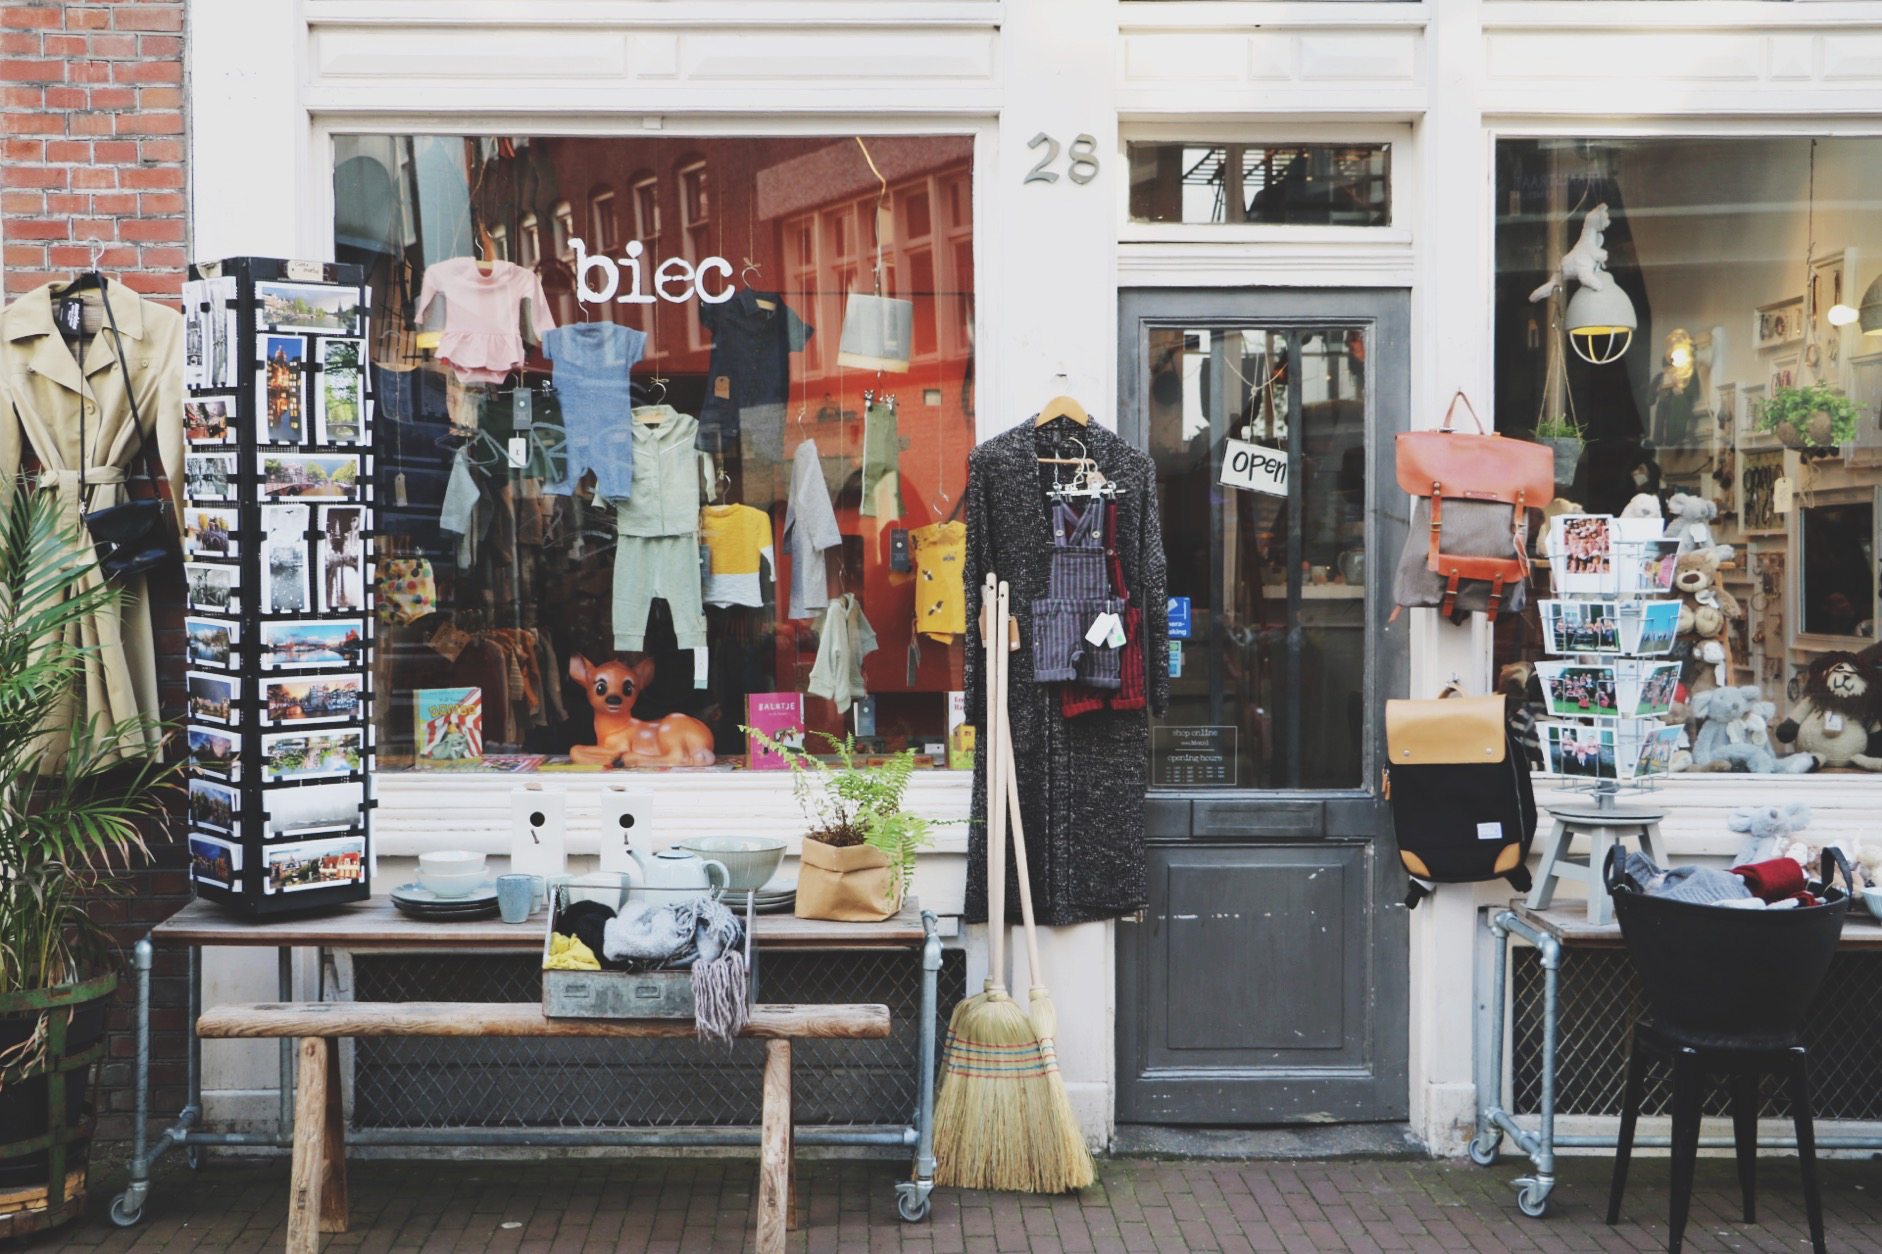 Tassen winkel in amsterdam : De leukste winkels van amsterdam moderne hippies